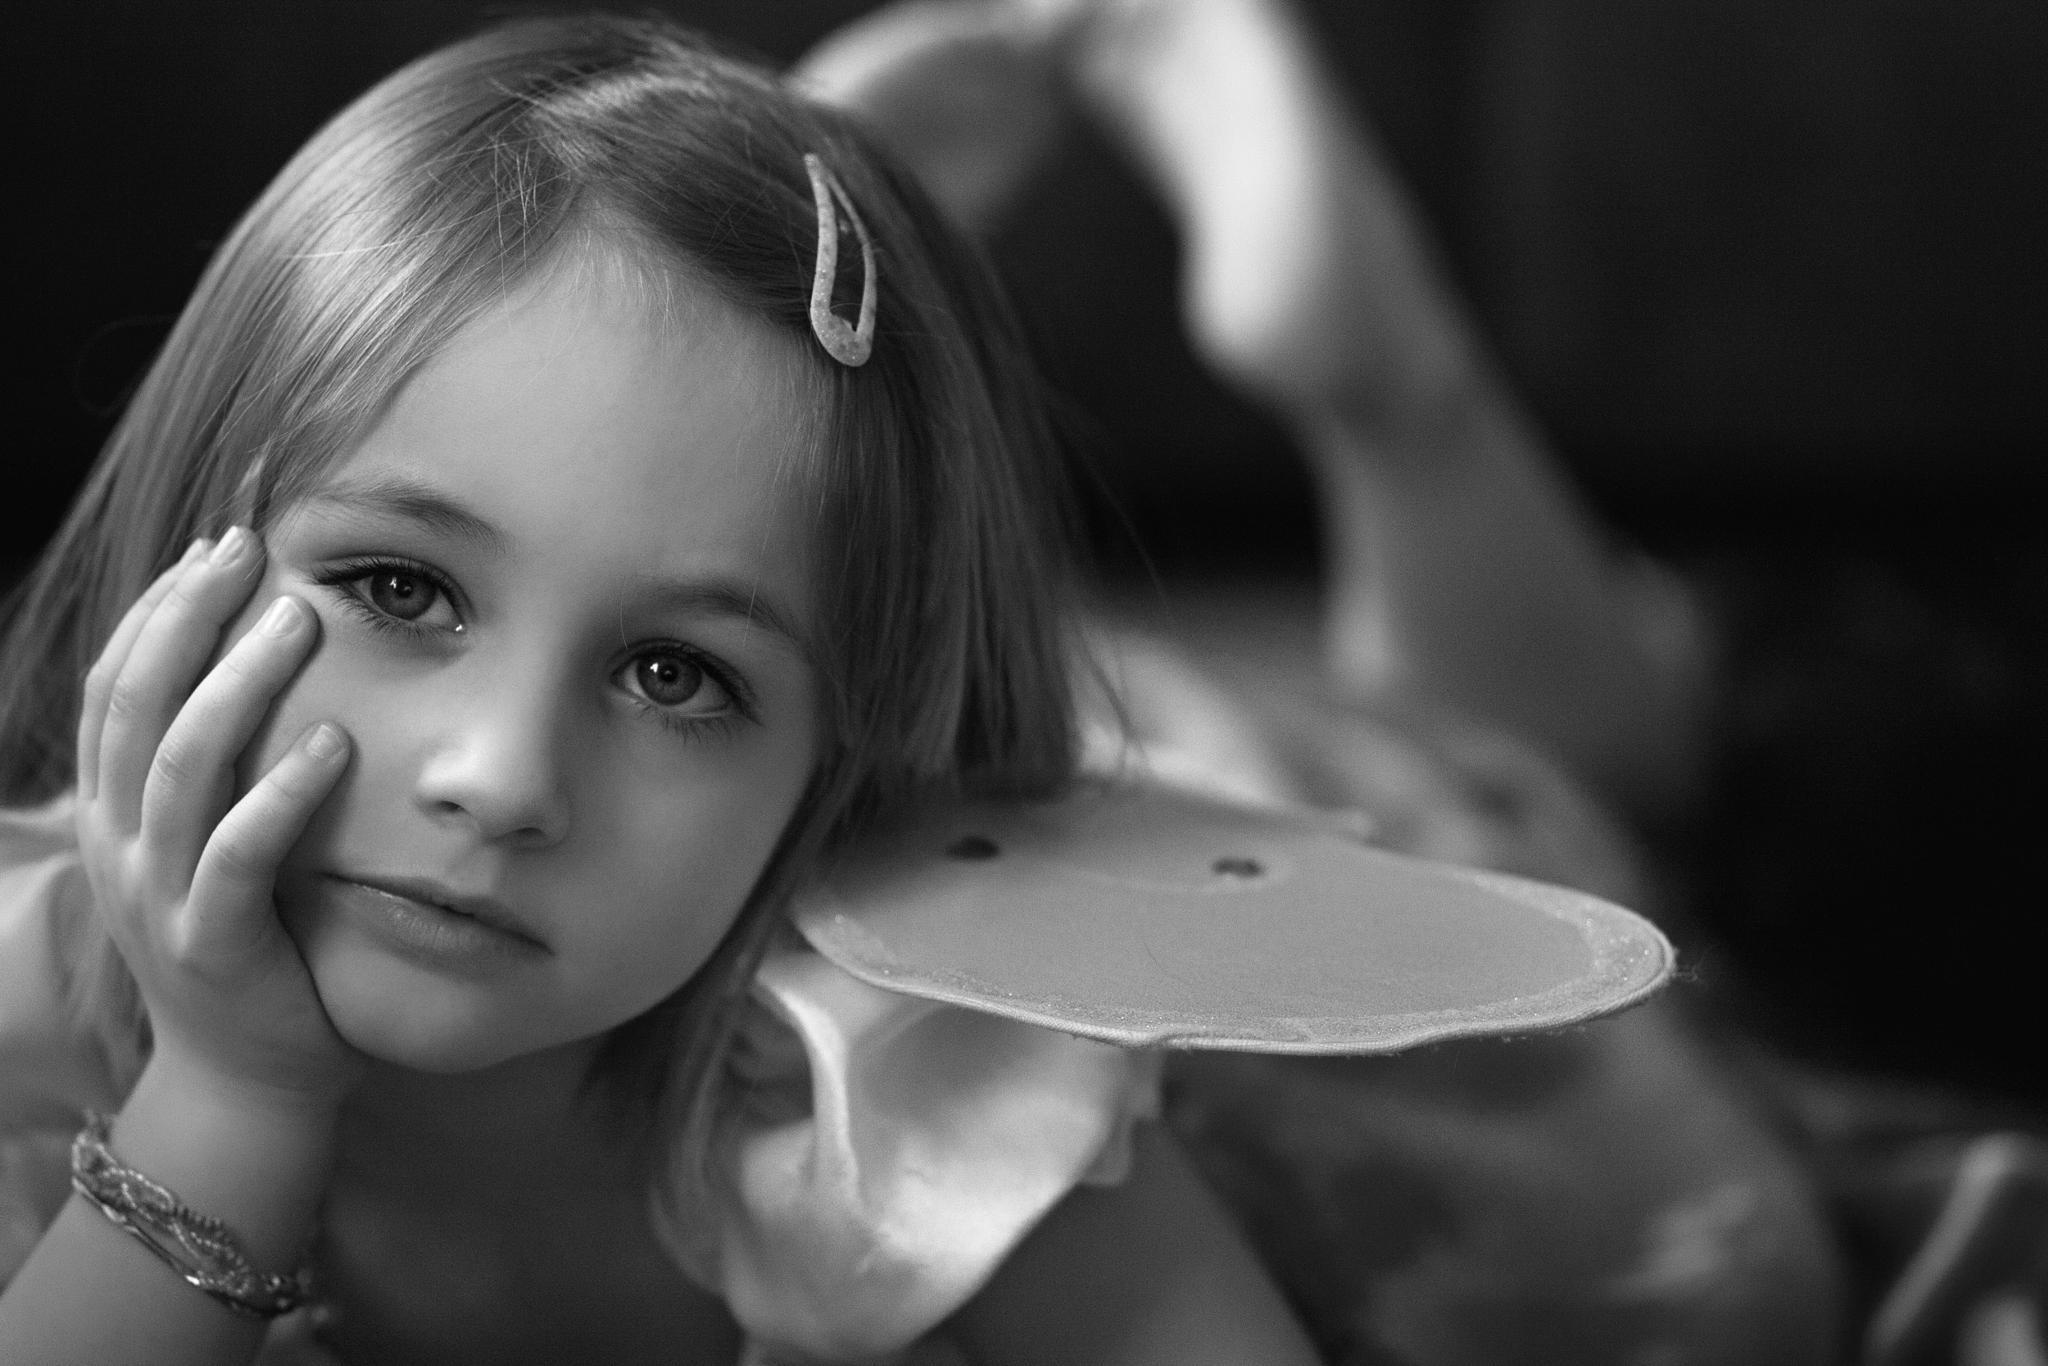 Petite fée by LidiaVanhamme